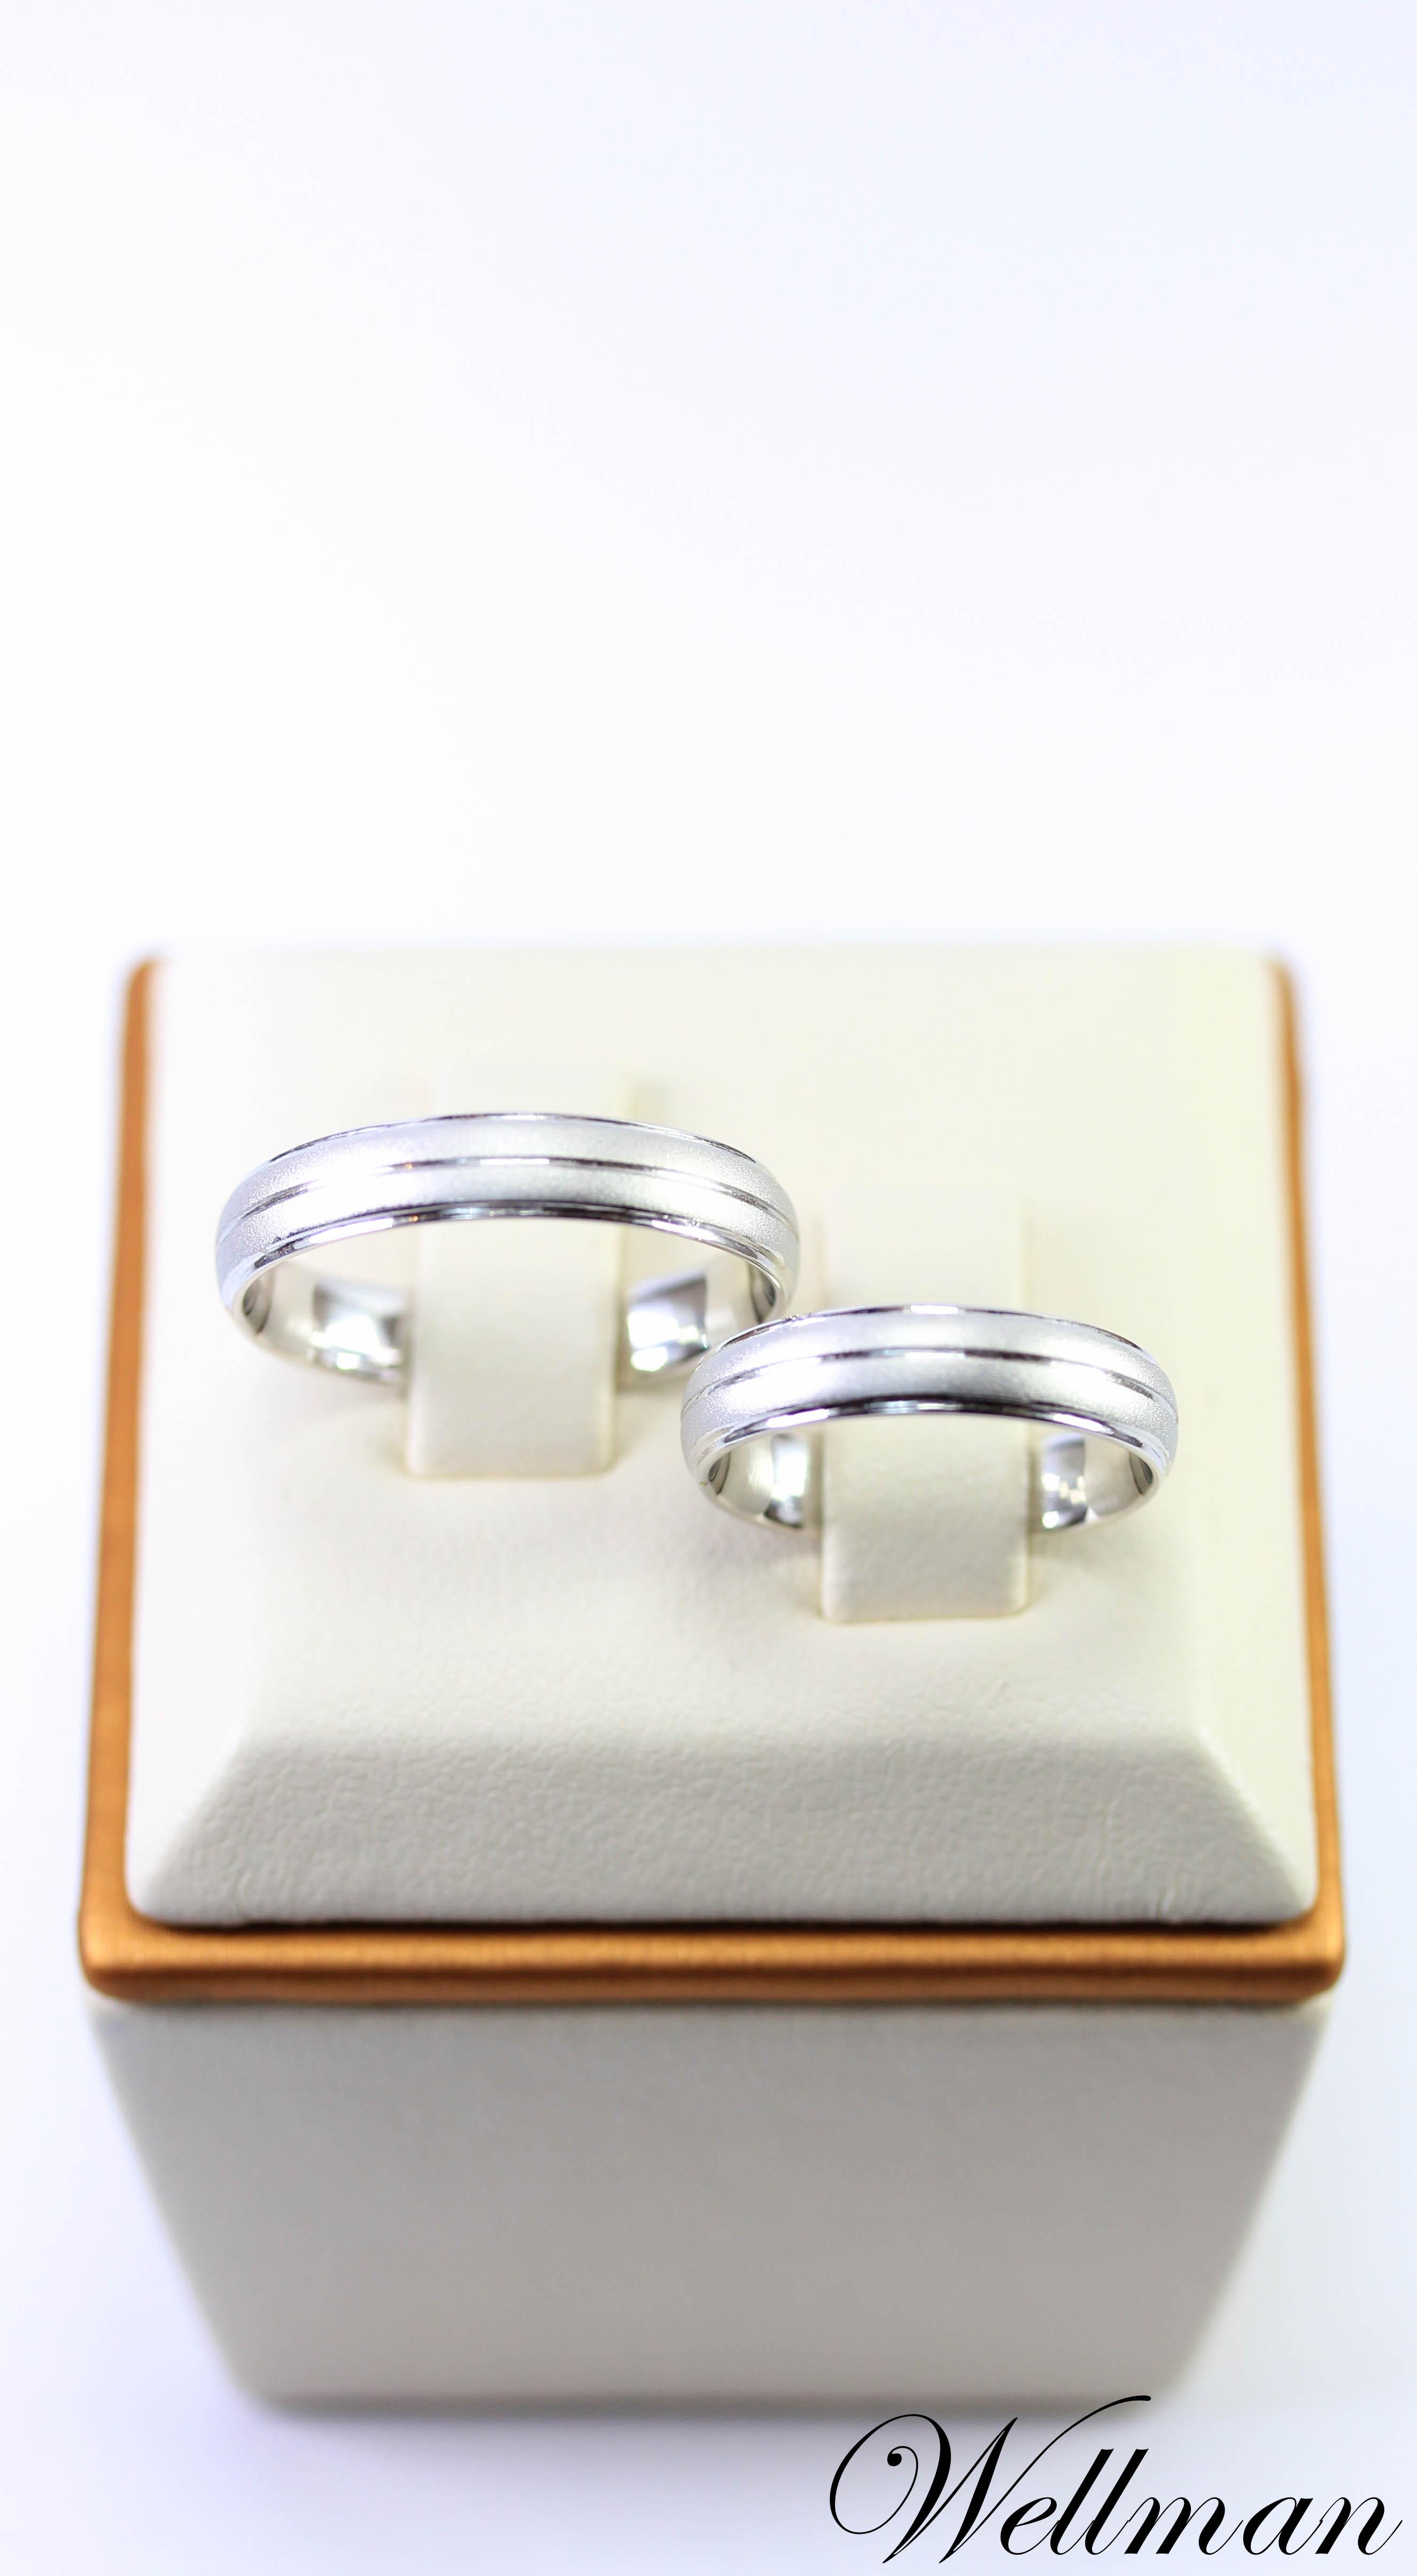 Wedding Ring Promo